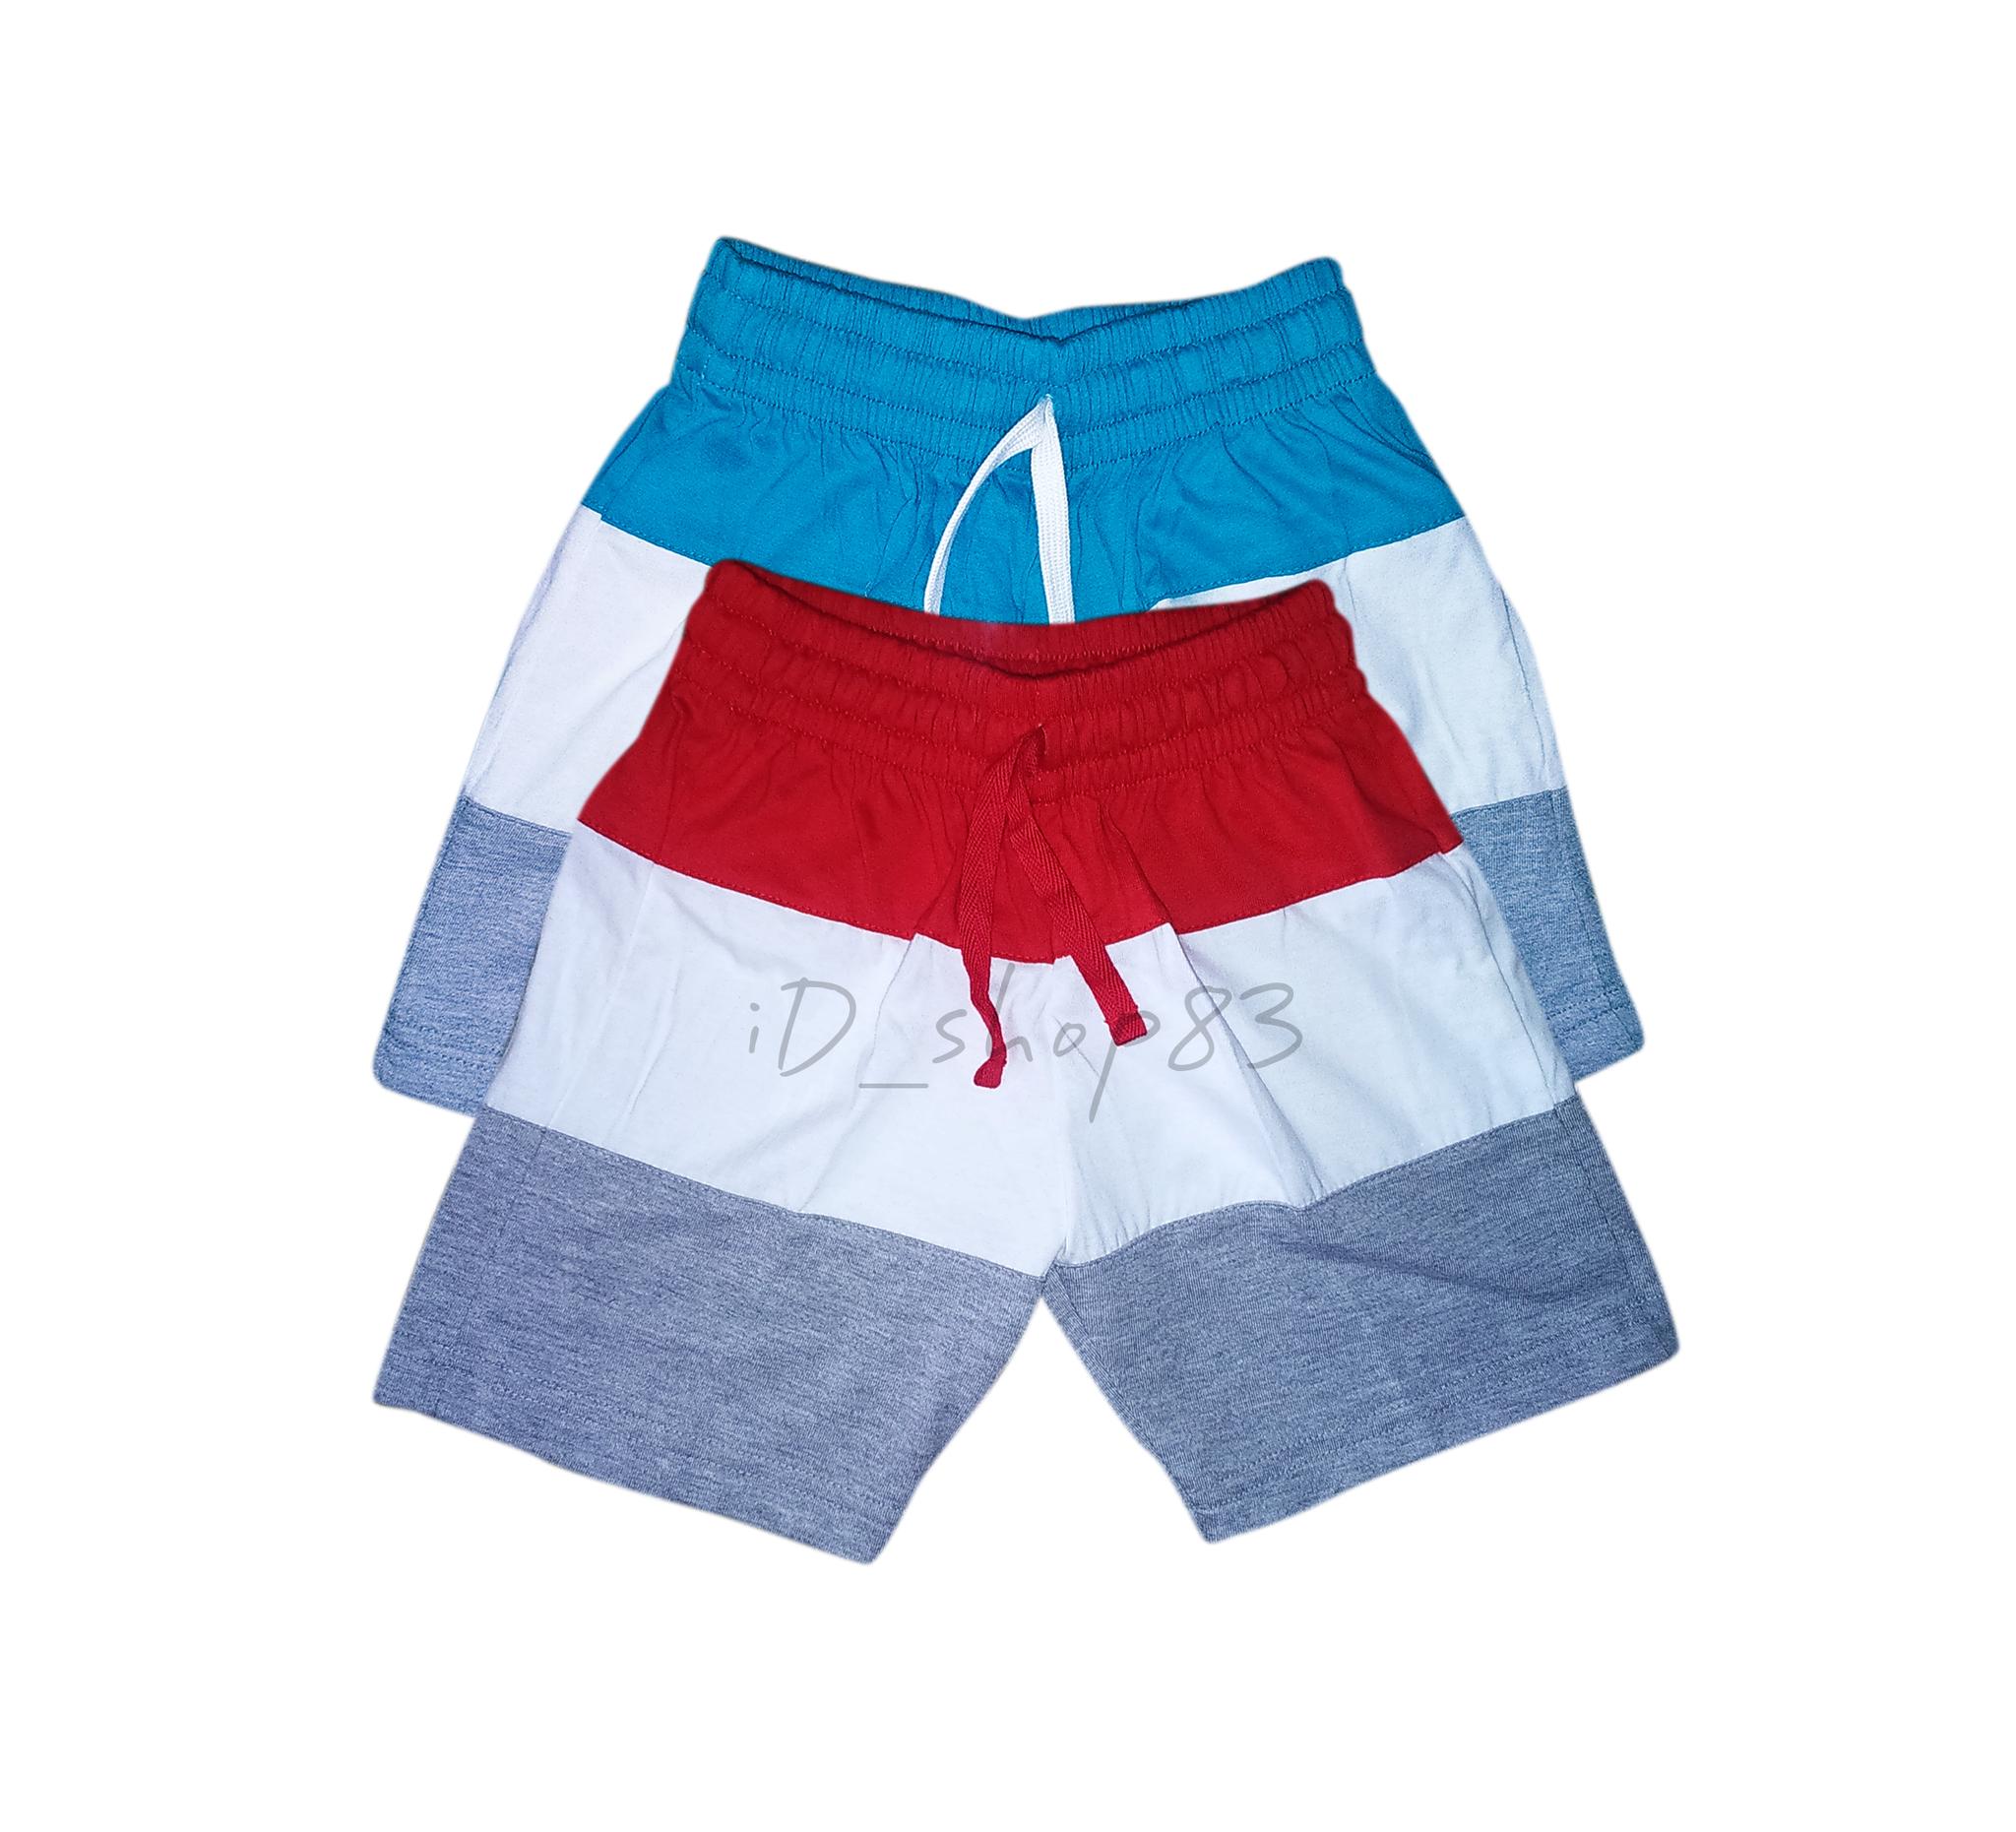 Gudang Fashion New Trendy Celana Pantai Bermotif Modis Hijau Pendek Distro Pria Polyester Multi Colour Cln 736 Jual Anak Kombinasi Warna